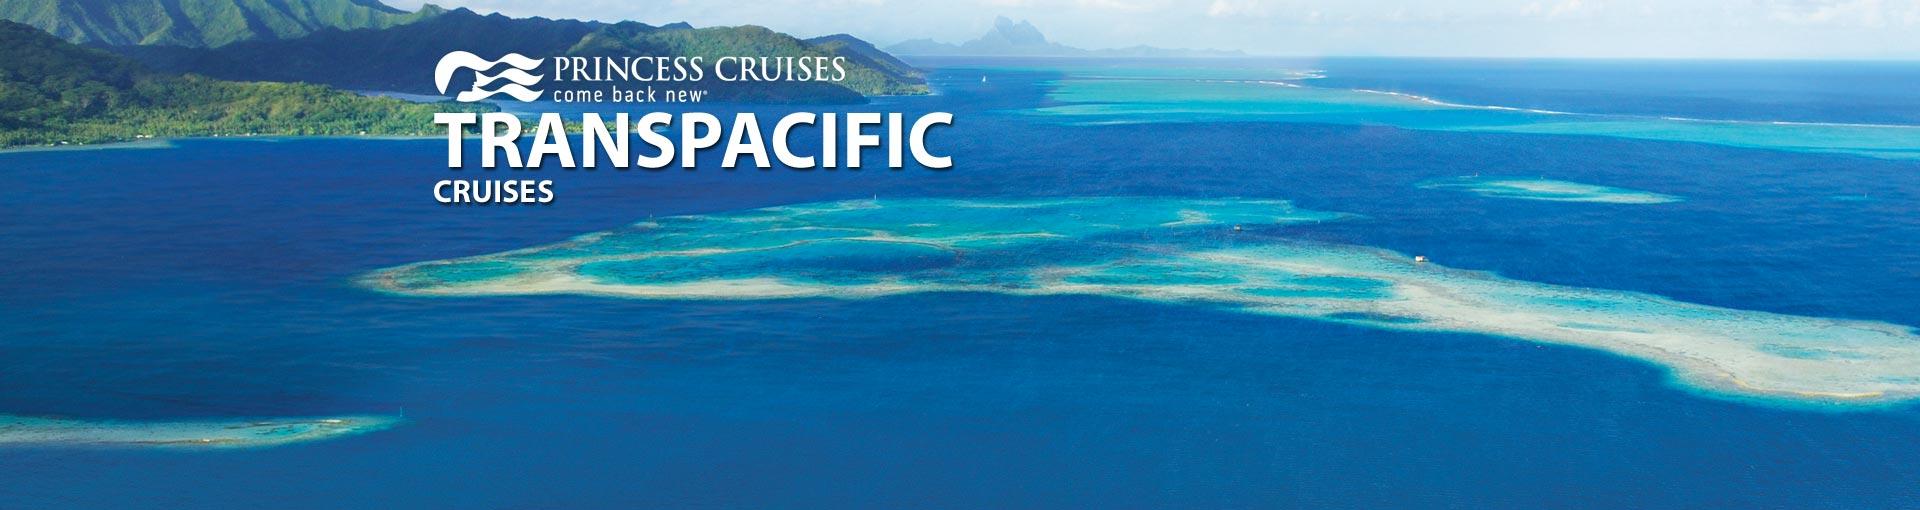 Princess Cruises Transpacific Cruises